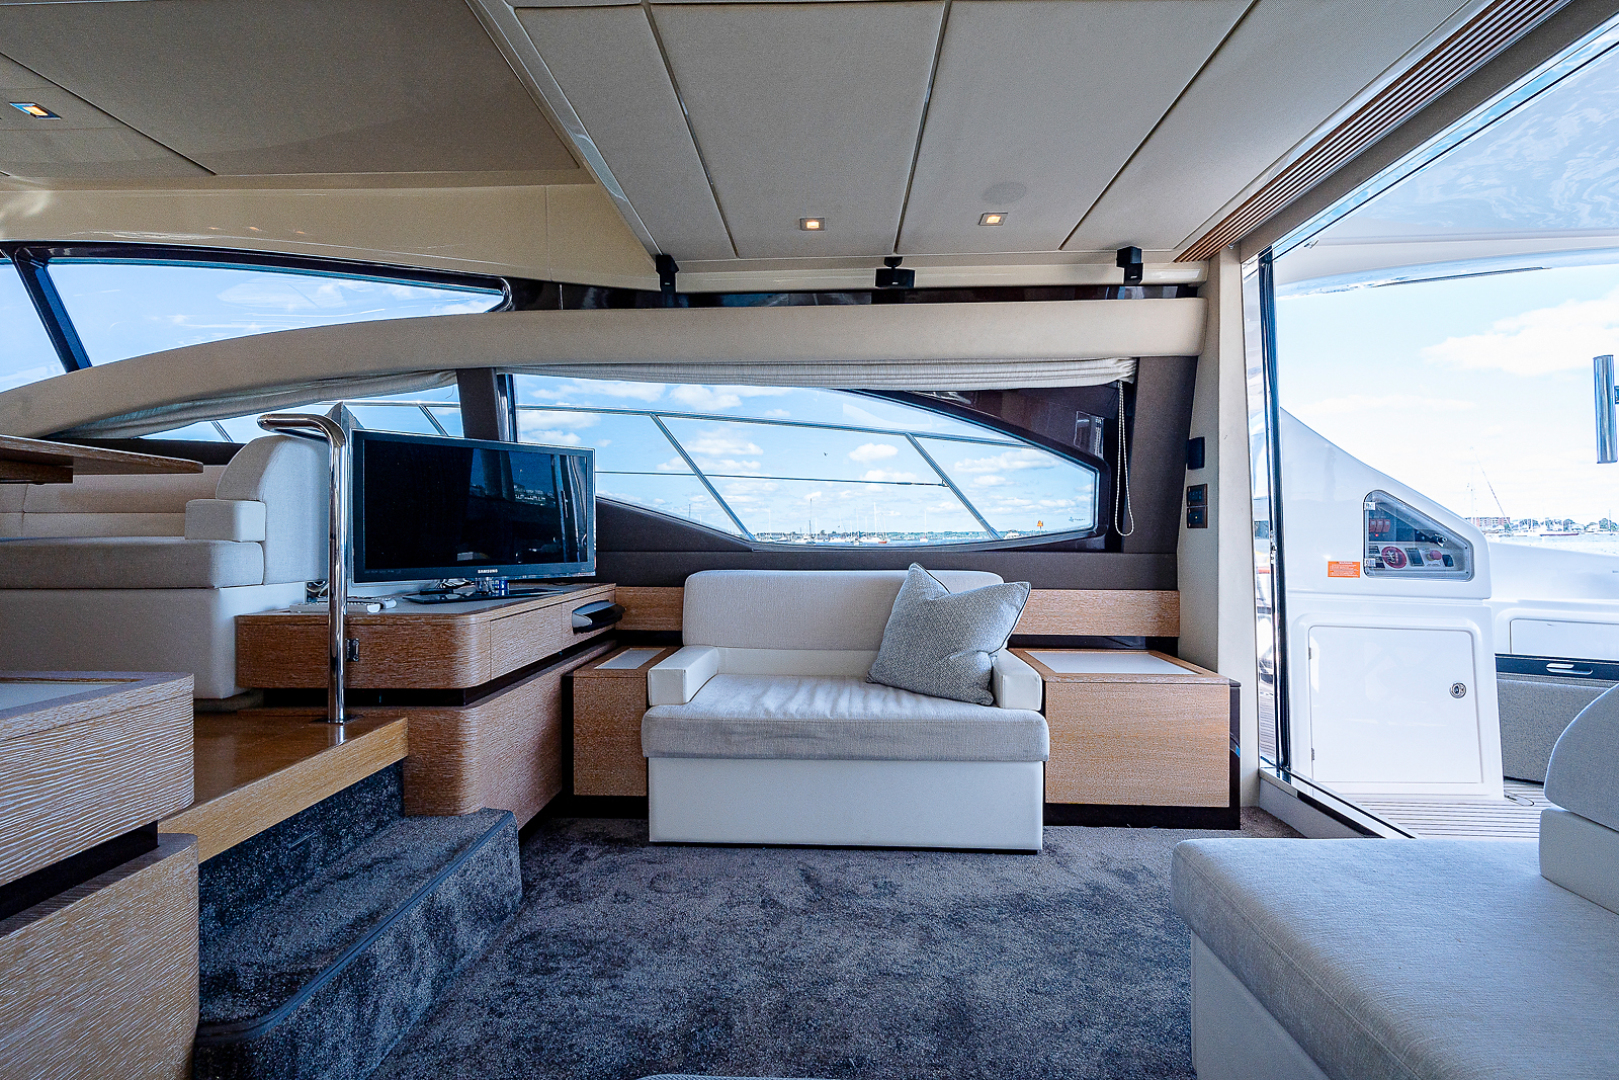 Azimut-58 Fly Motor Yacht 2011-Nova Fort Lauderdale-Florida-United States-58_azimut_nova__salon12-1490471 | Thumbnail